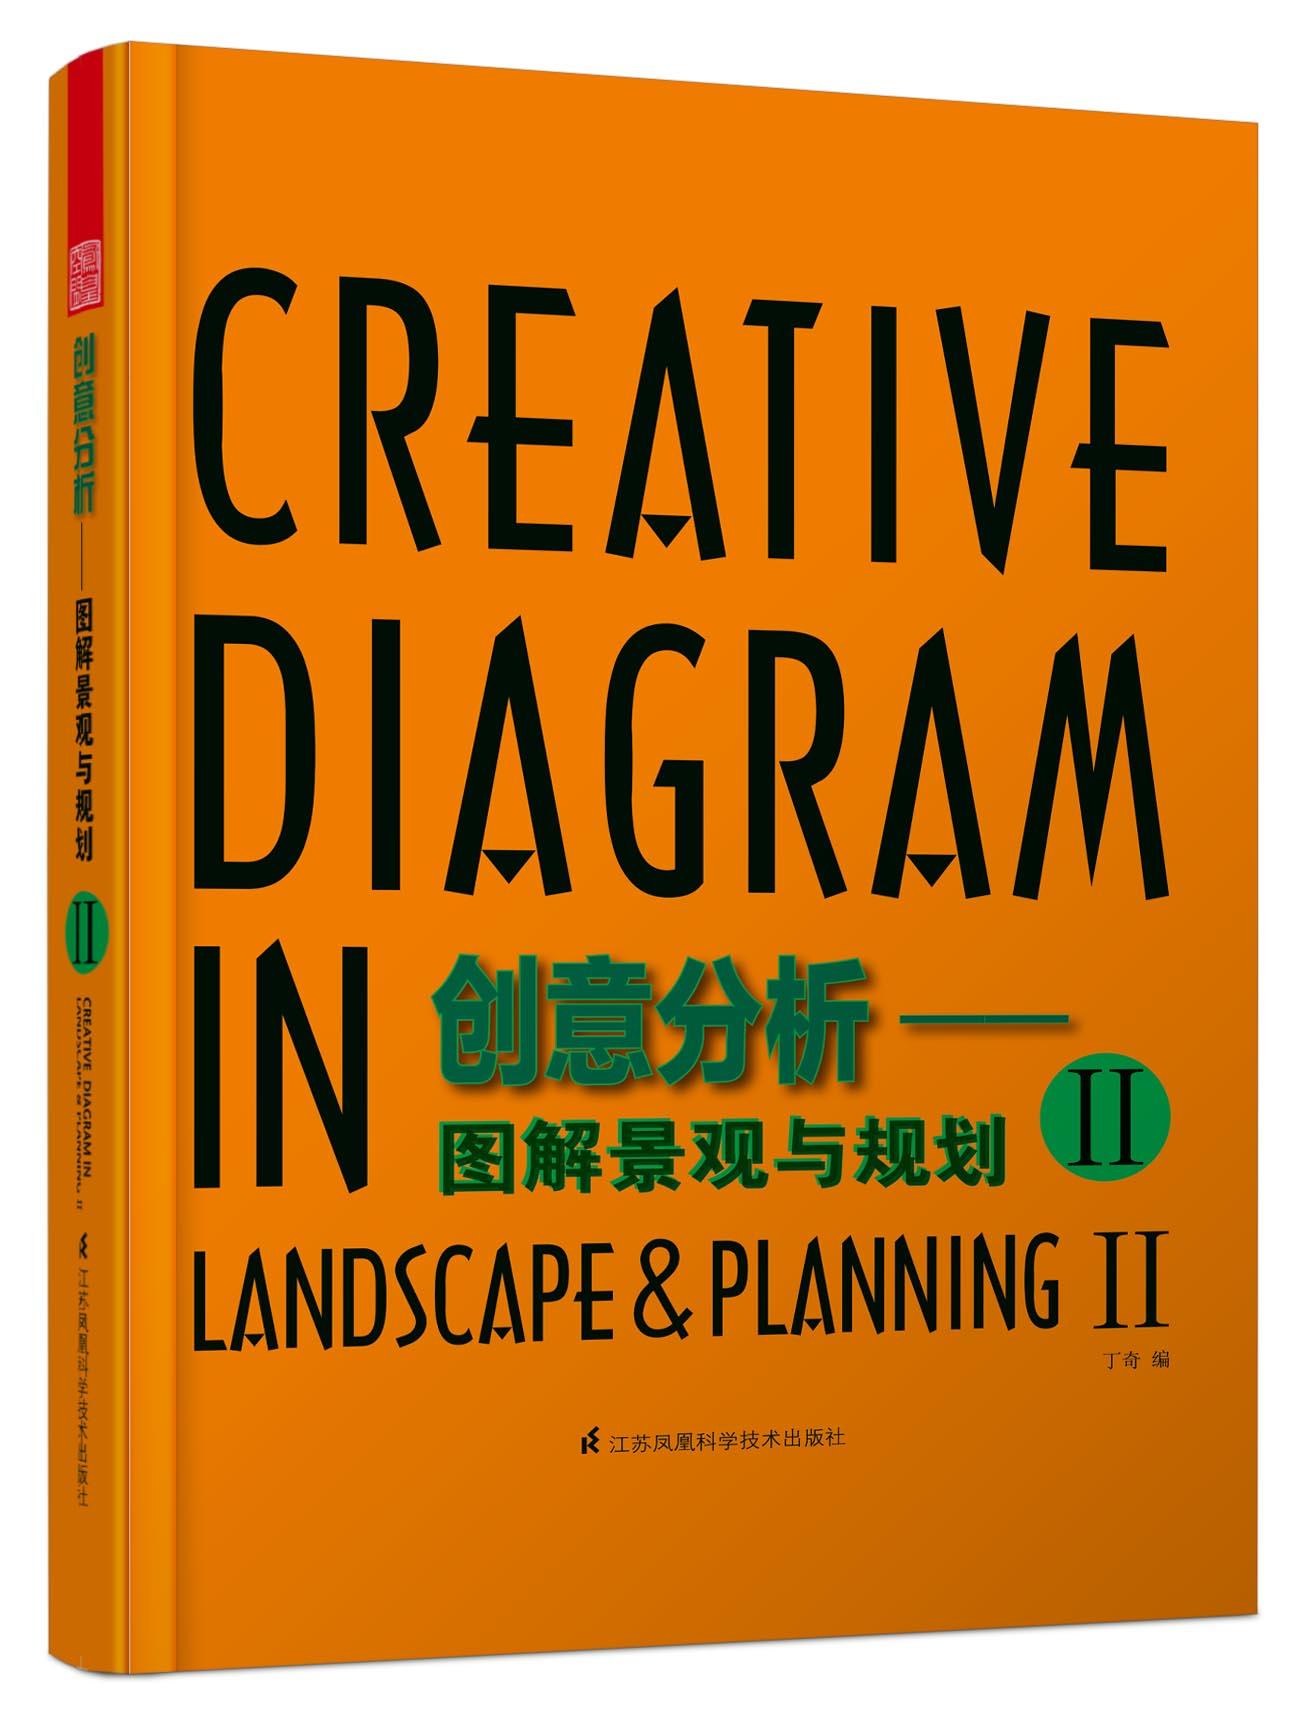 Creative diagram in landscpe planning ii ifengspace design book name creative diagram in landscpe planning ii ccuart Choice Image